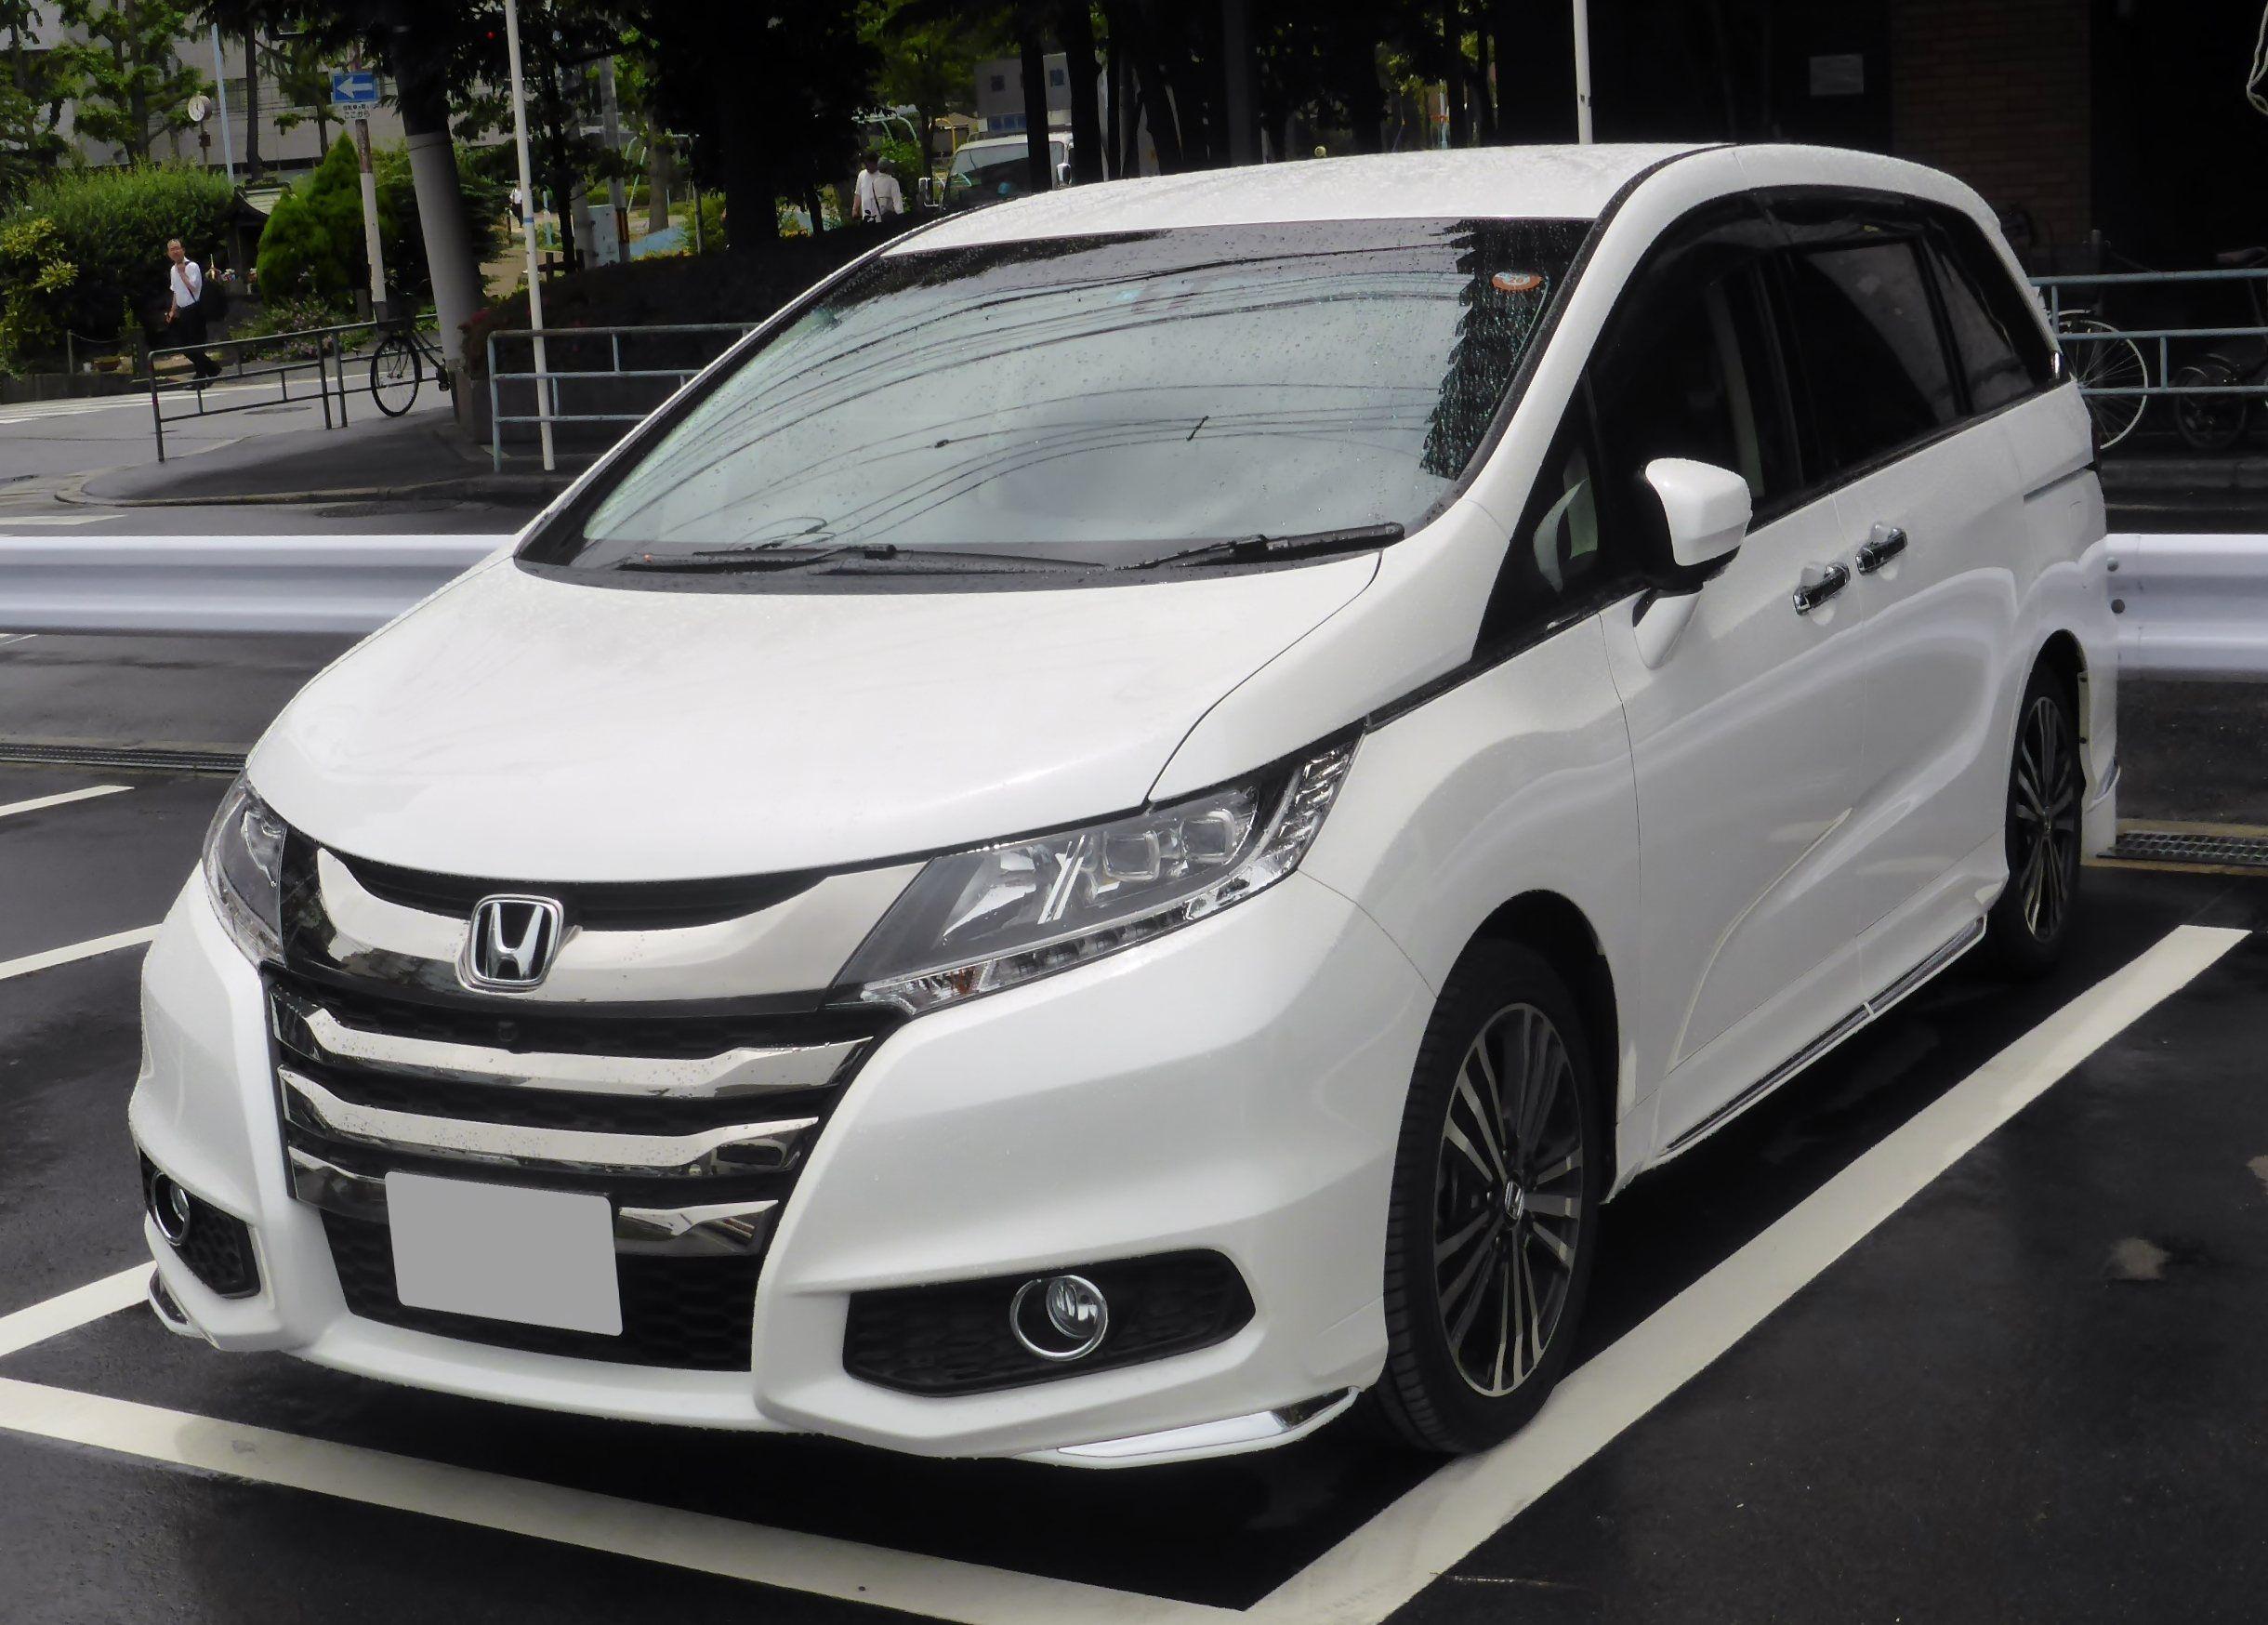 2021 Honda Accord Coupe Spirior Research New